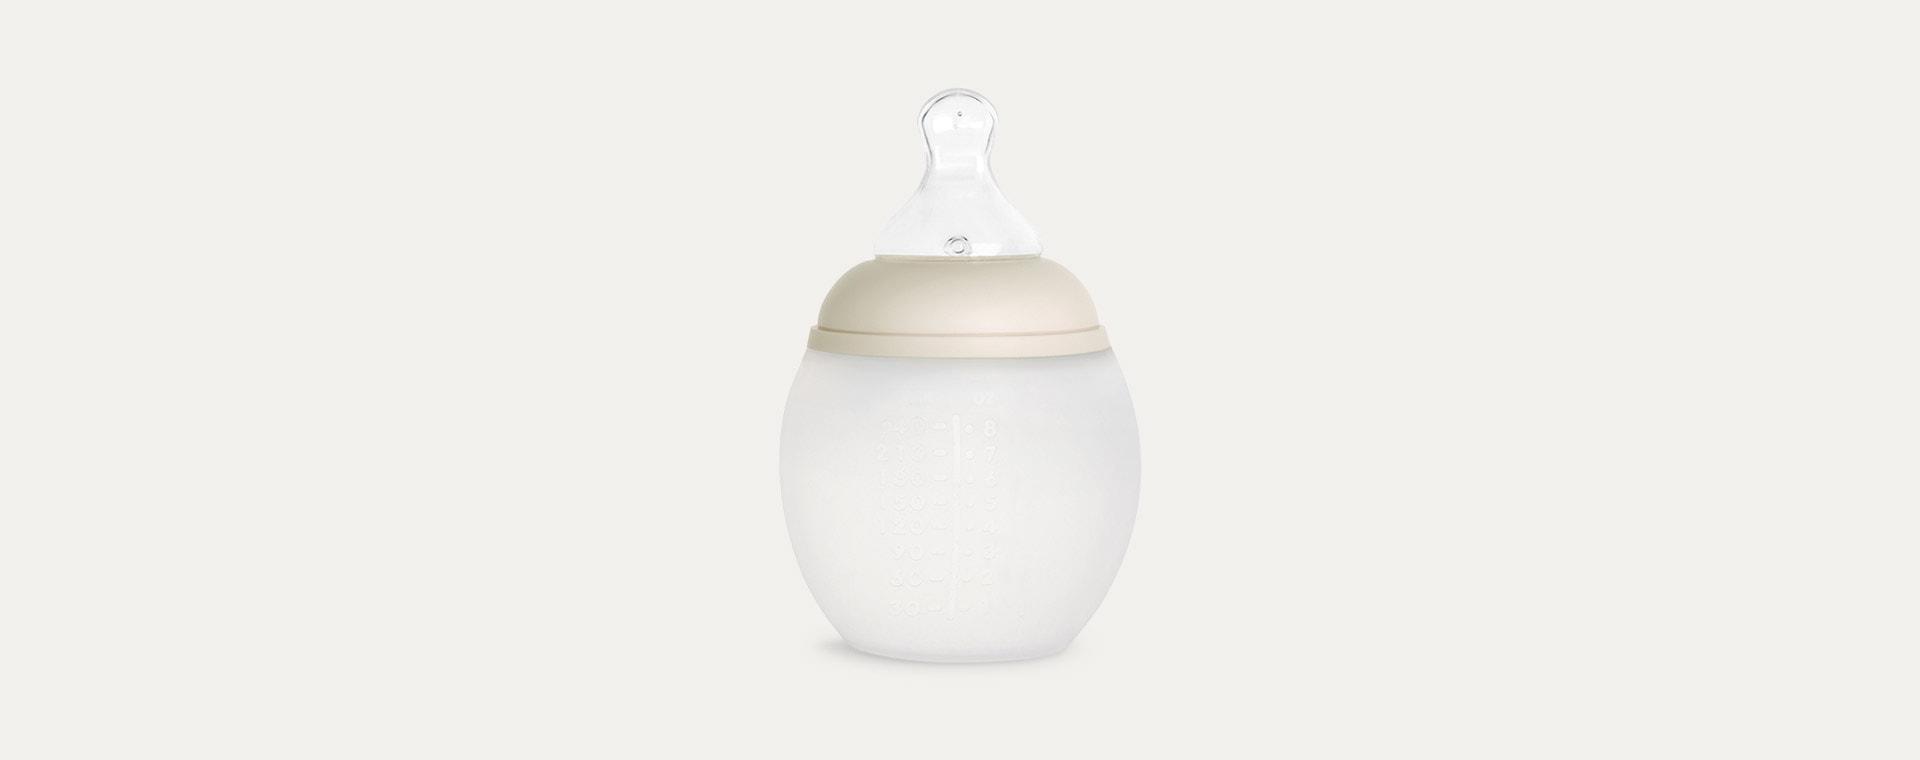 Sand Elhee Baby Bottle